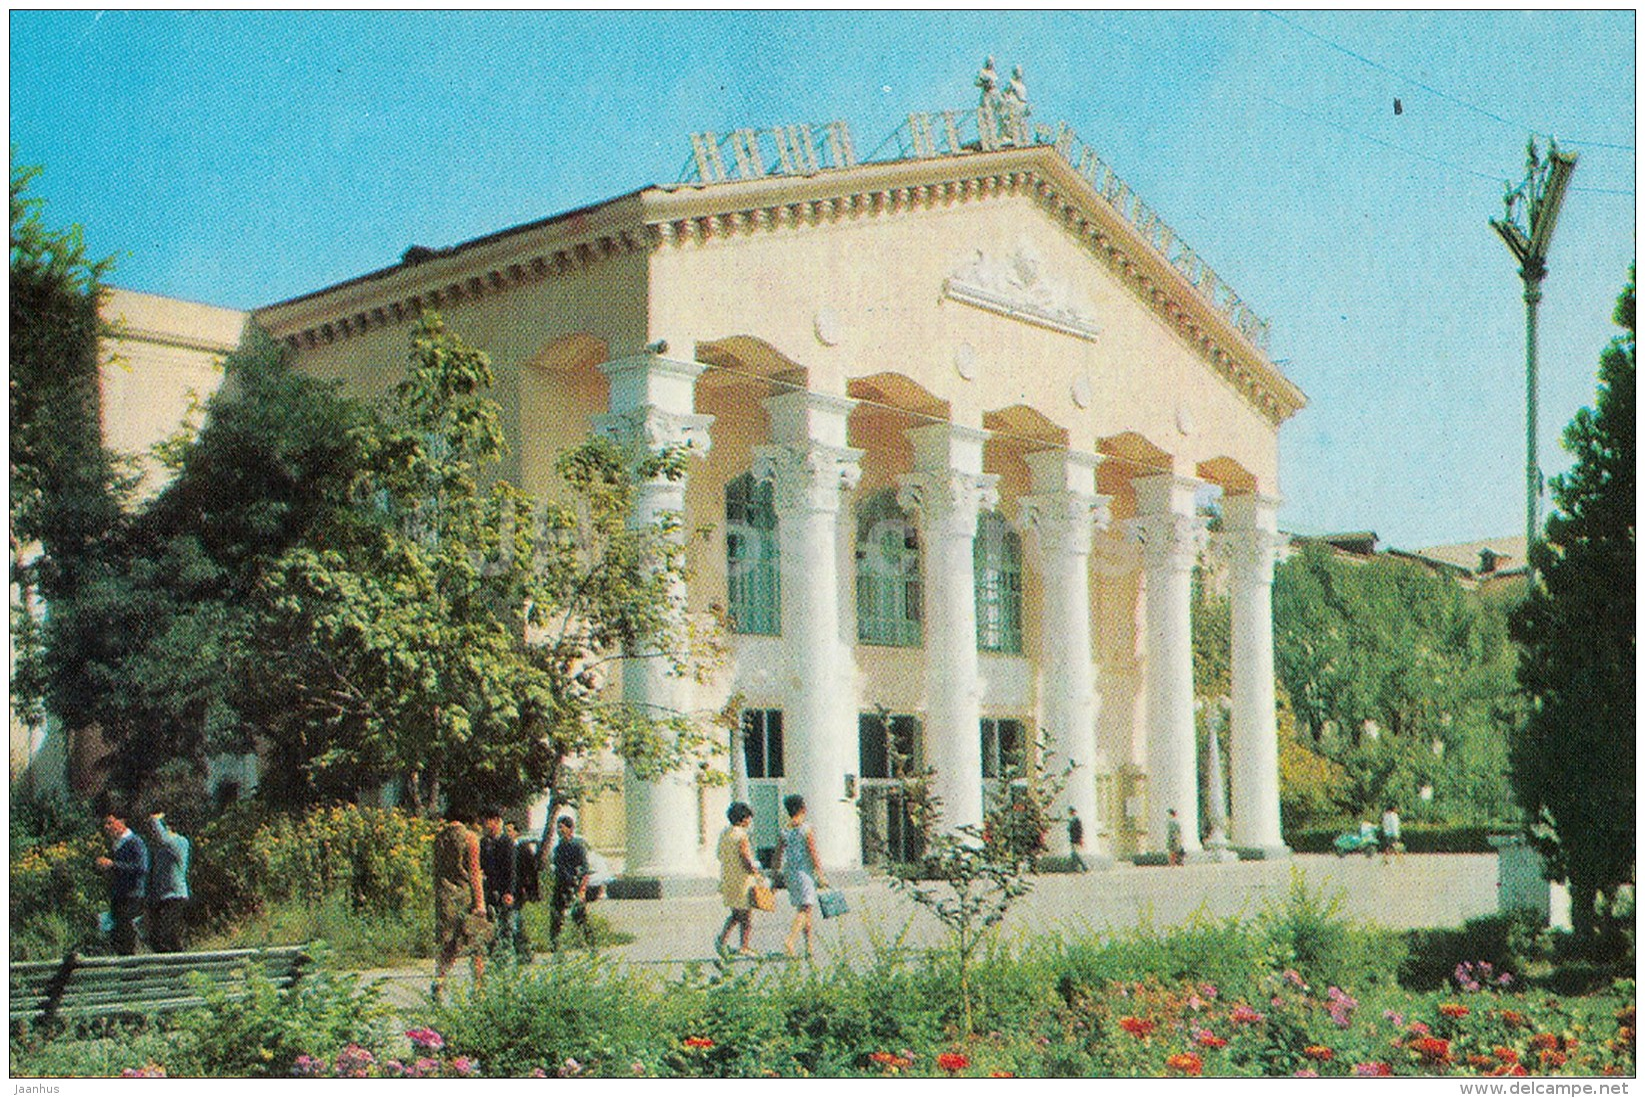 Kyrgyz State University - Bishkek - Frunze - 1970 - Kyrgystan USSR - Unused - Kirghizistan